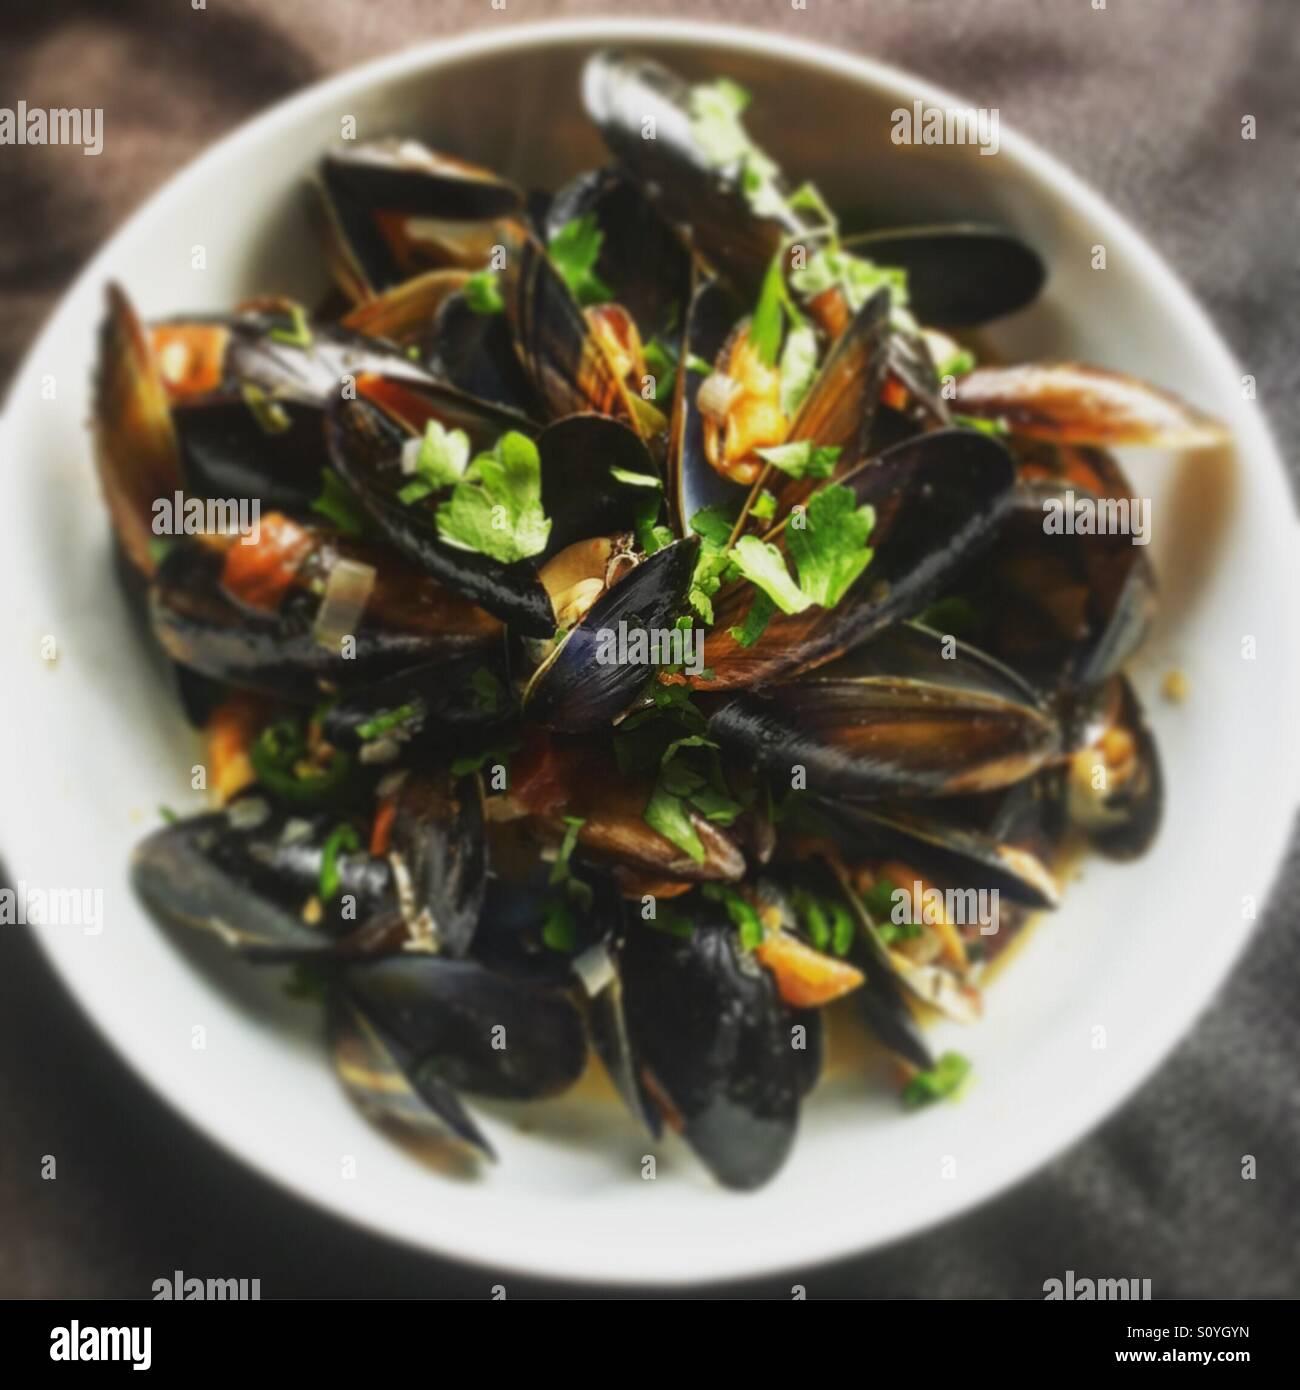 Gesunde Meeresfrüchte Muscheln Stockbild